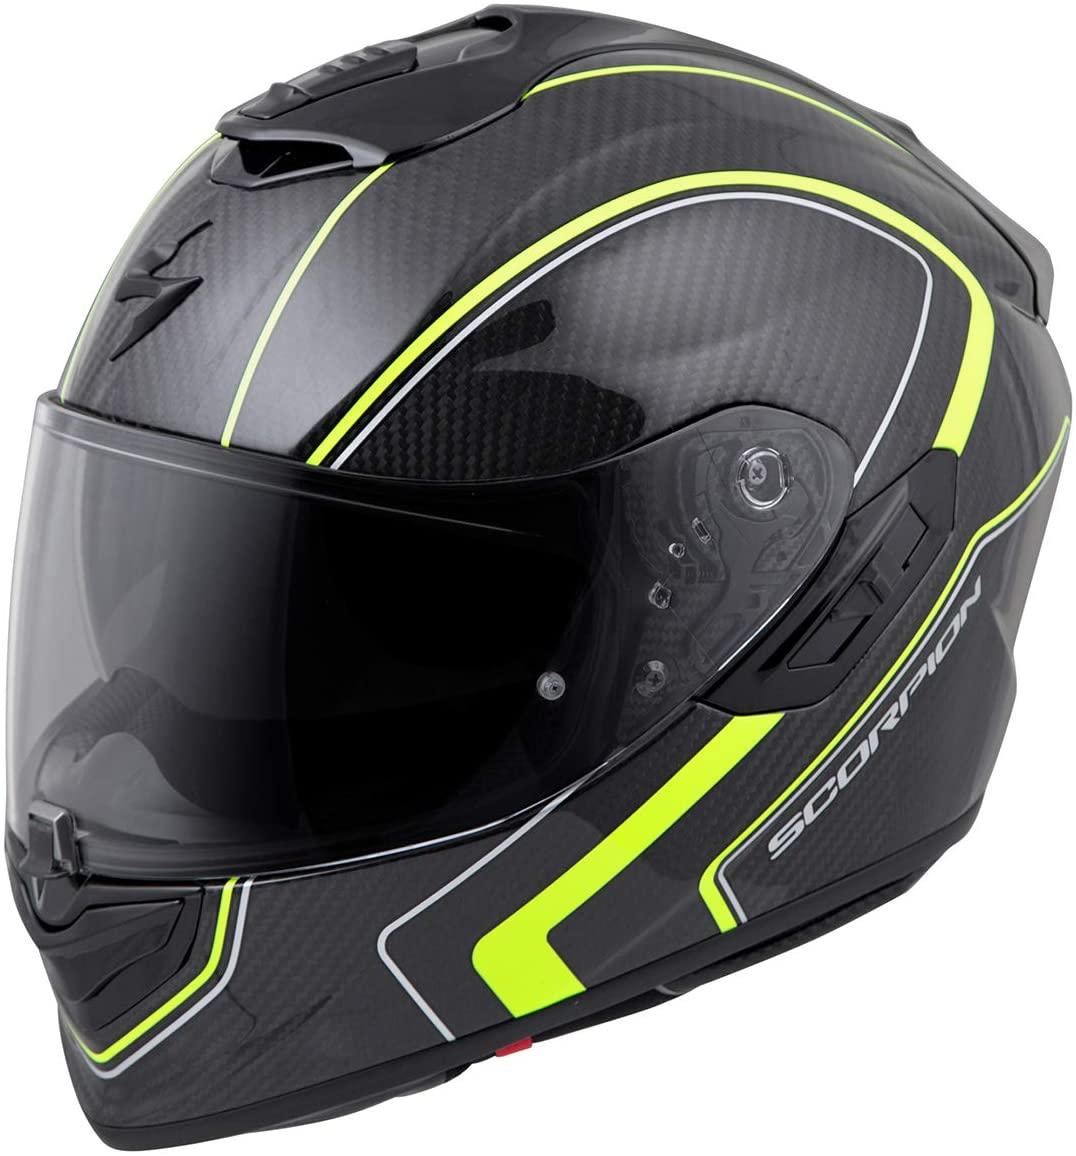 Scorpion ST1400 Carbon Helmet - Antrim (Large) (HI-VIS)